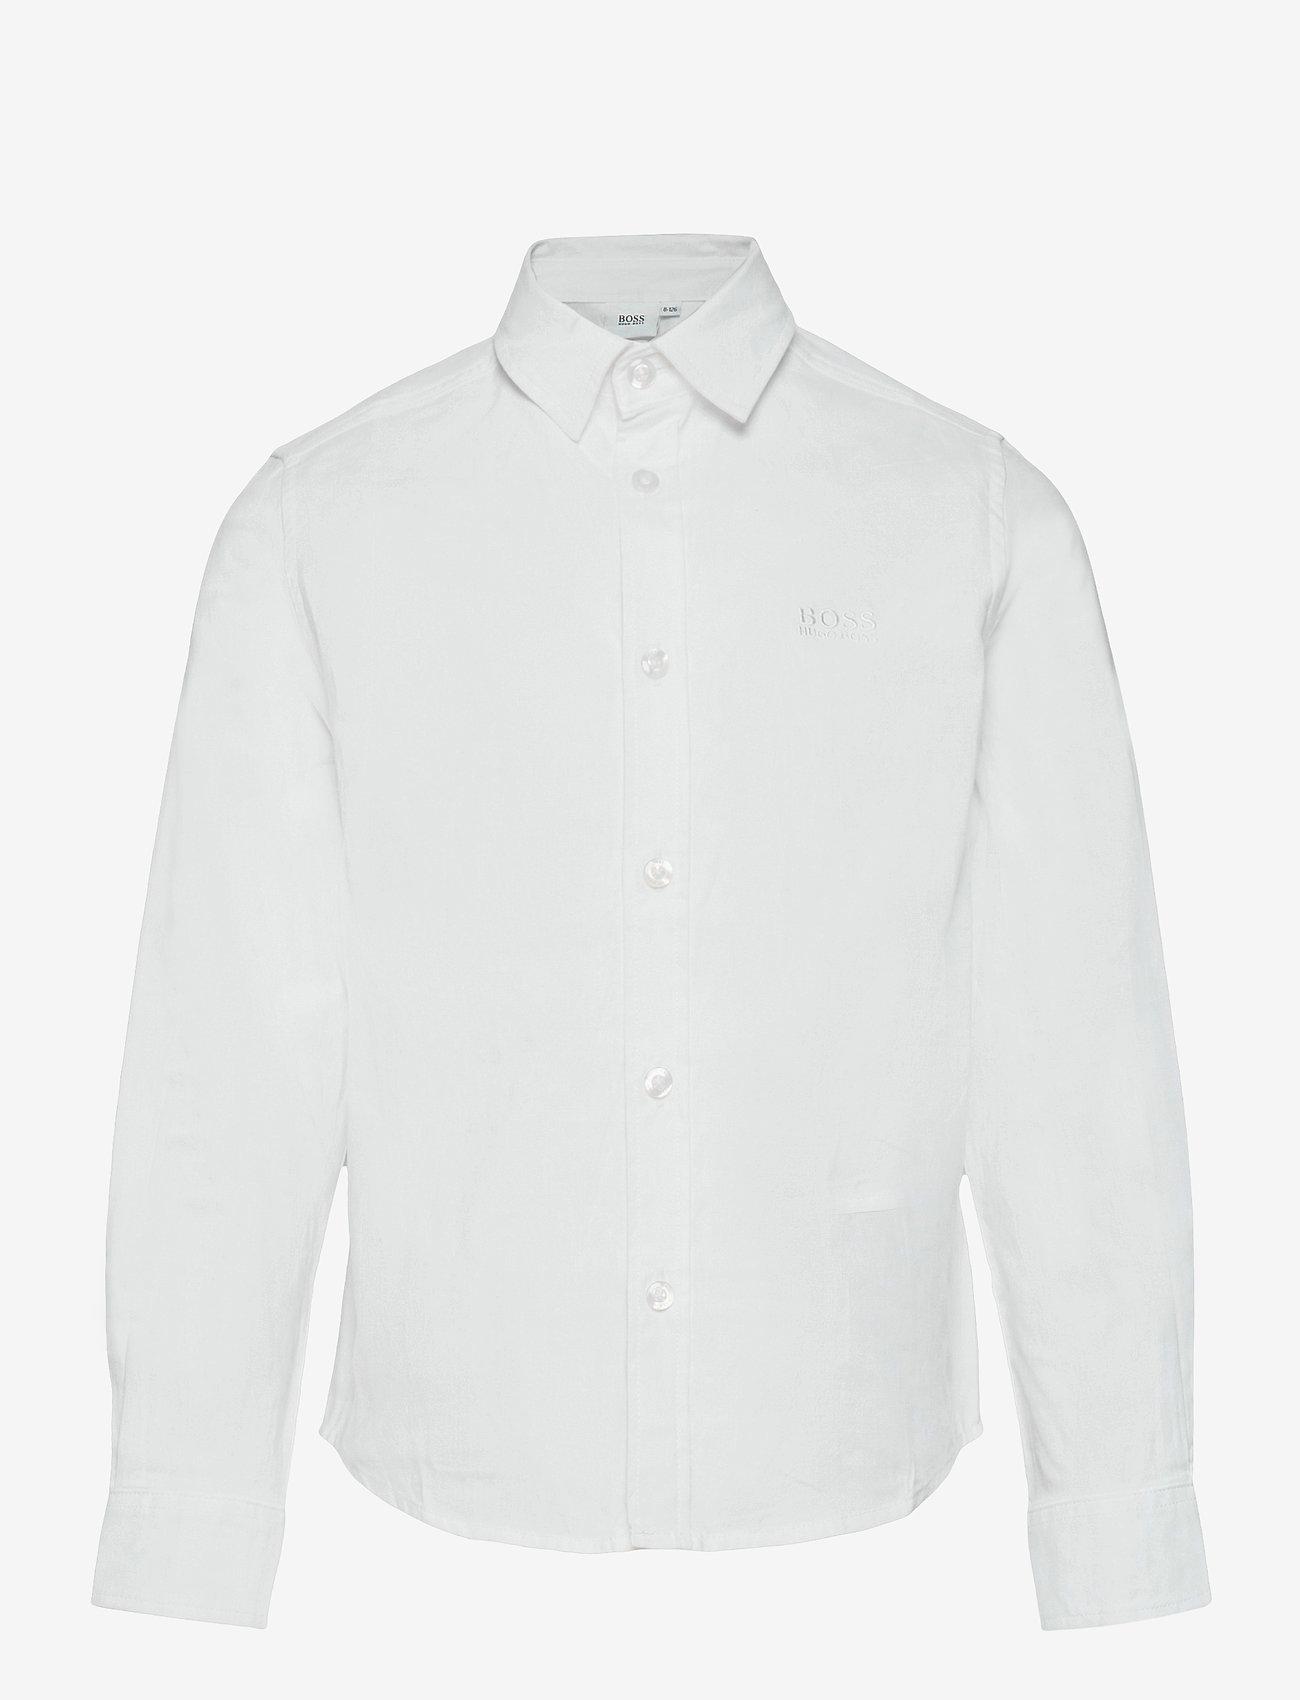 BOSS - SHIRT - shirts - white - 0